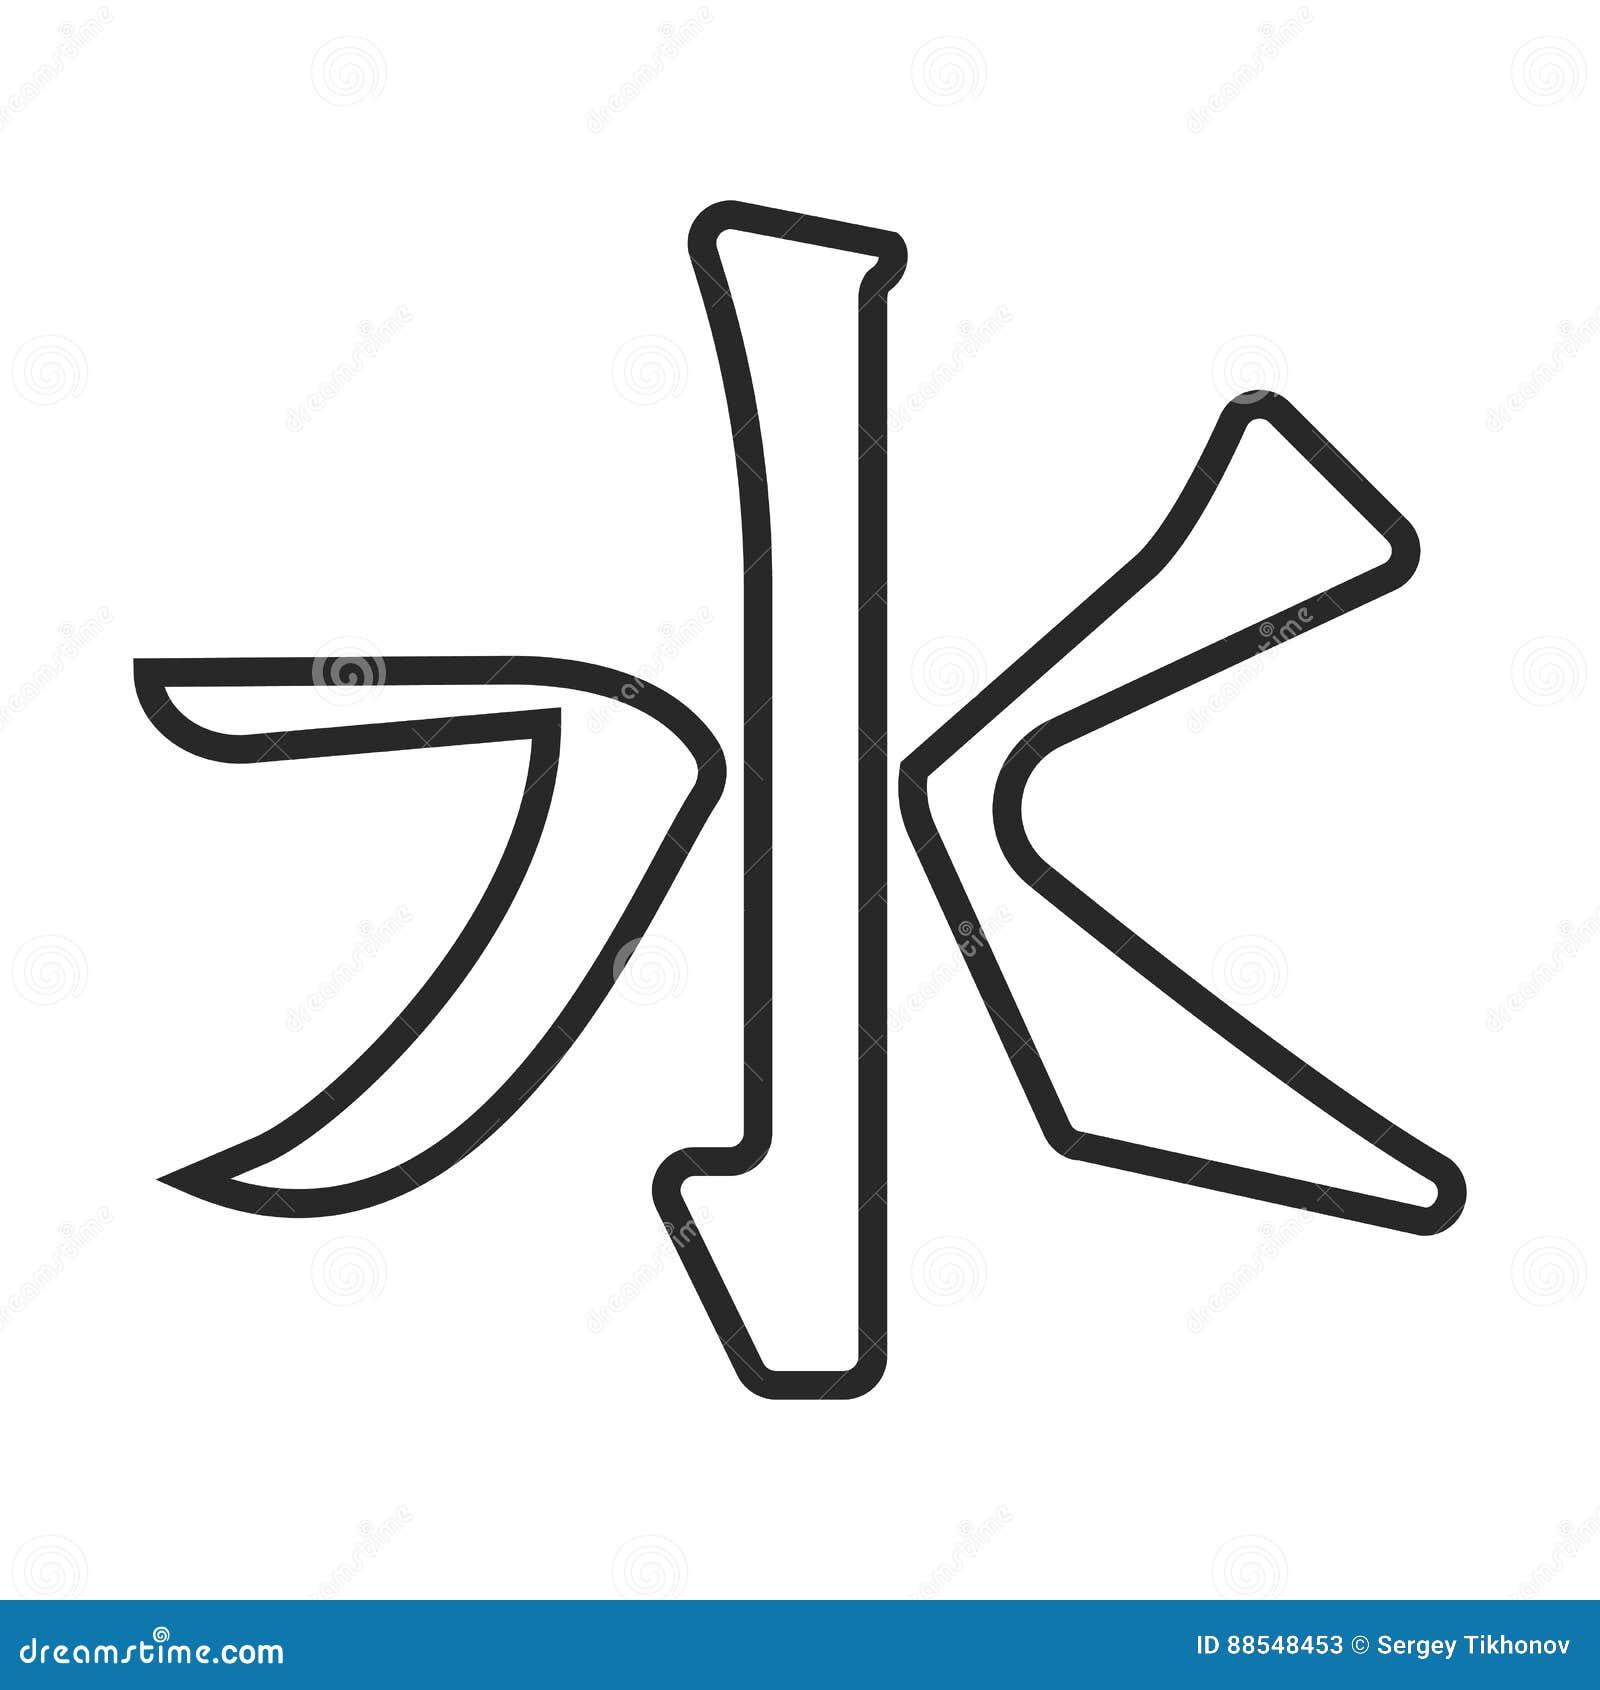 Confucianism symbol icon stock illustration illustration of black confucianism symbol icon biocorpaavc Images